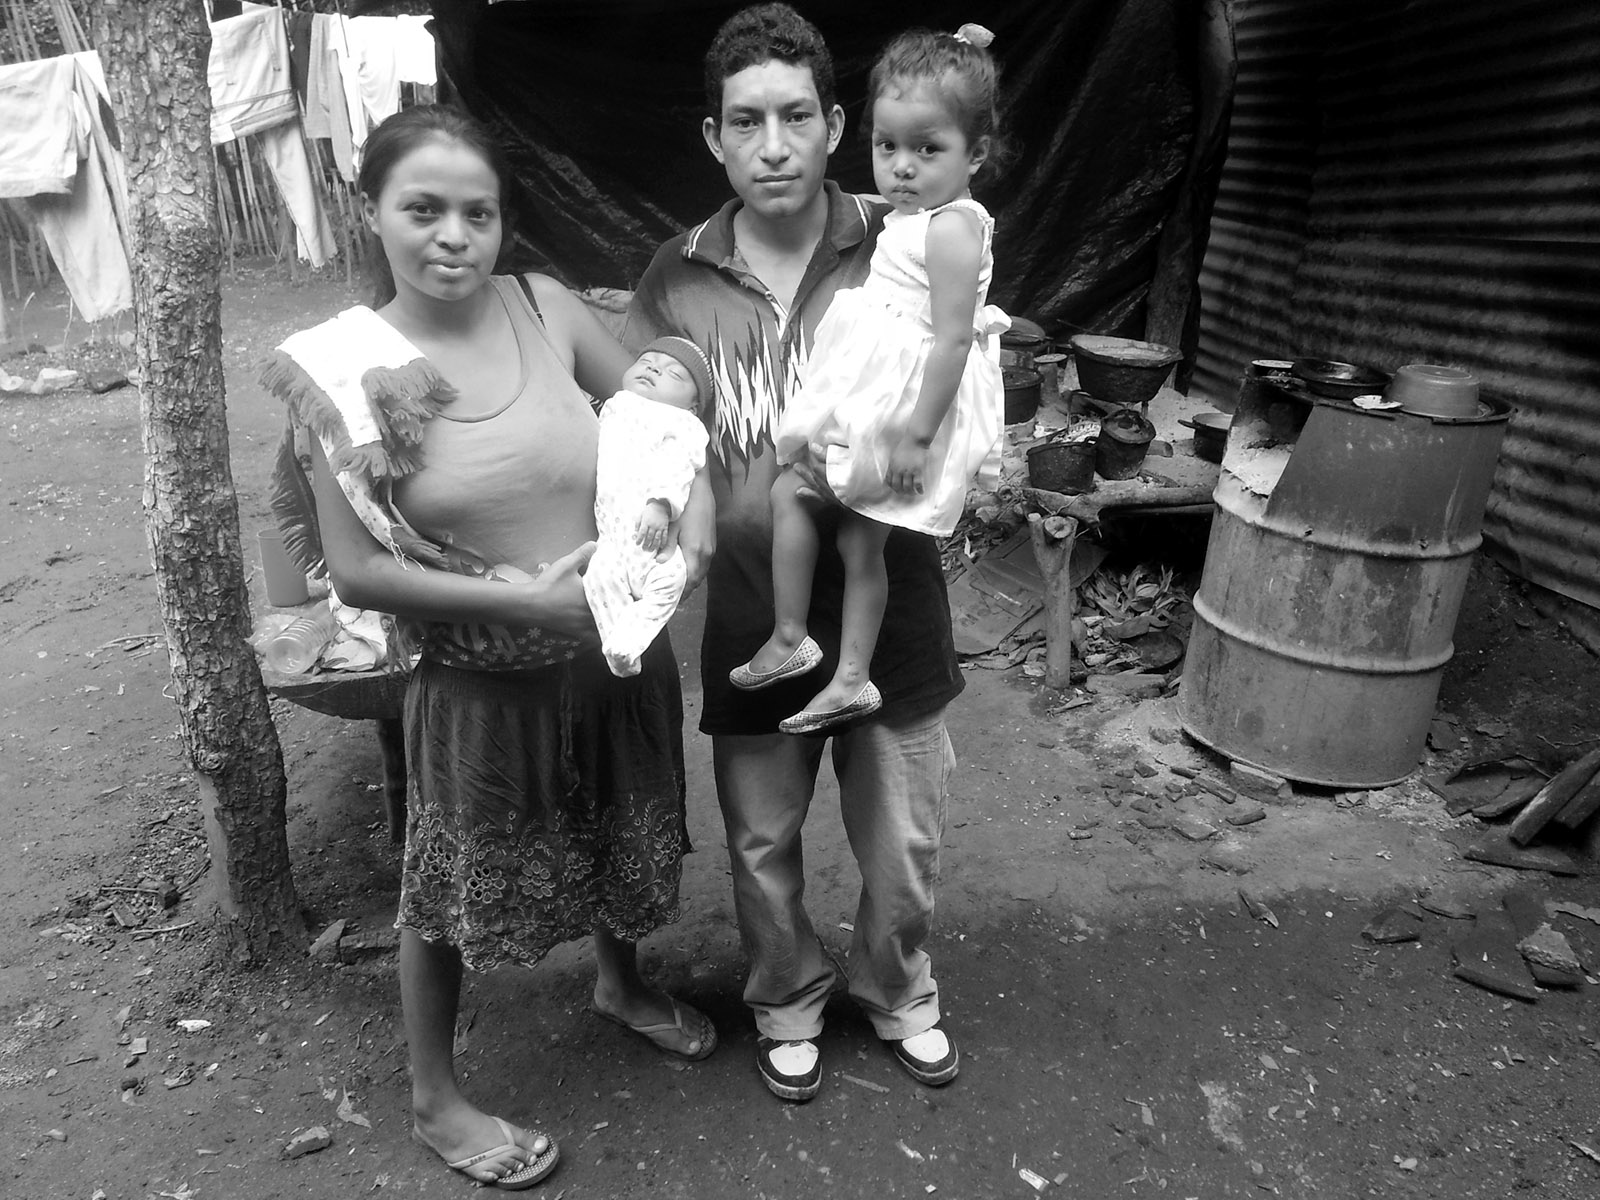 Miguel Ángel Tobar, known as the 'Hollywood Kid,' with his wife, Lorena, and their daughters, Las Pozas, El Salvador